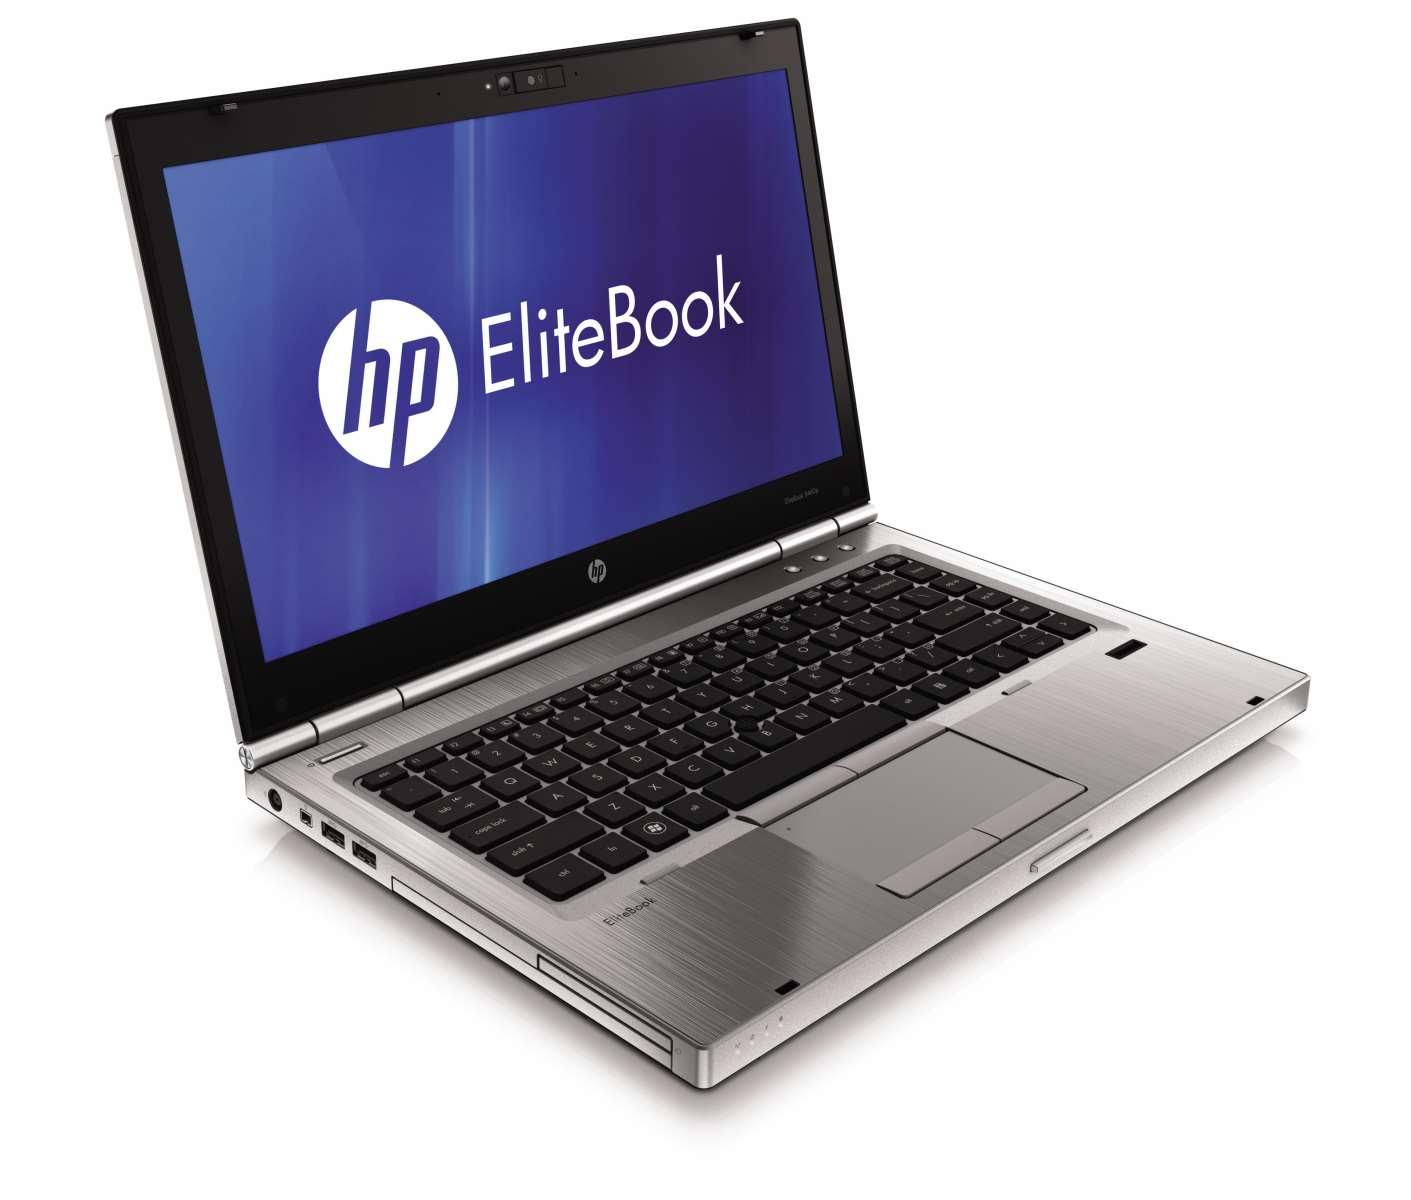 HP EliteBook 8460p; Intel Core i5/2.5, 4GB RAM, 320GB HD, DVD/RW